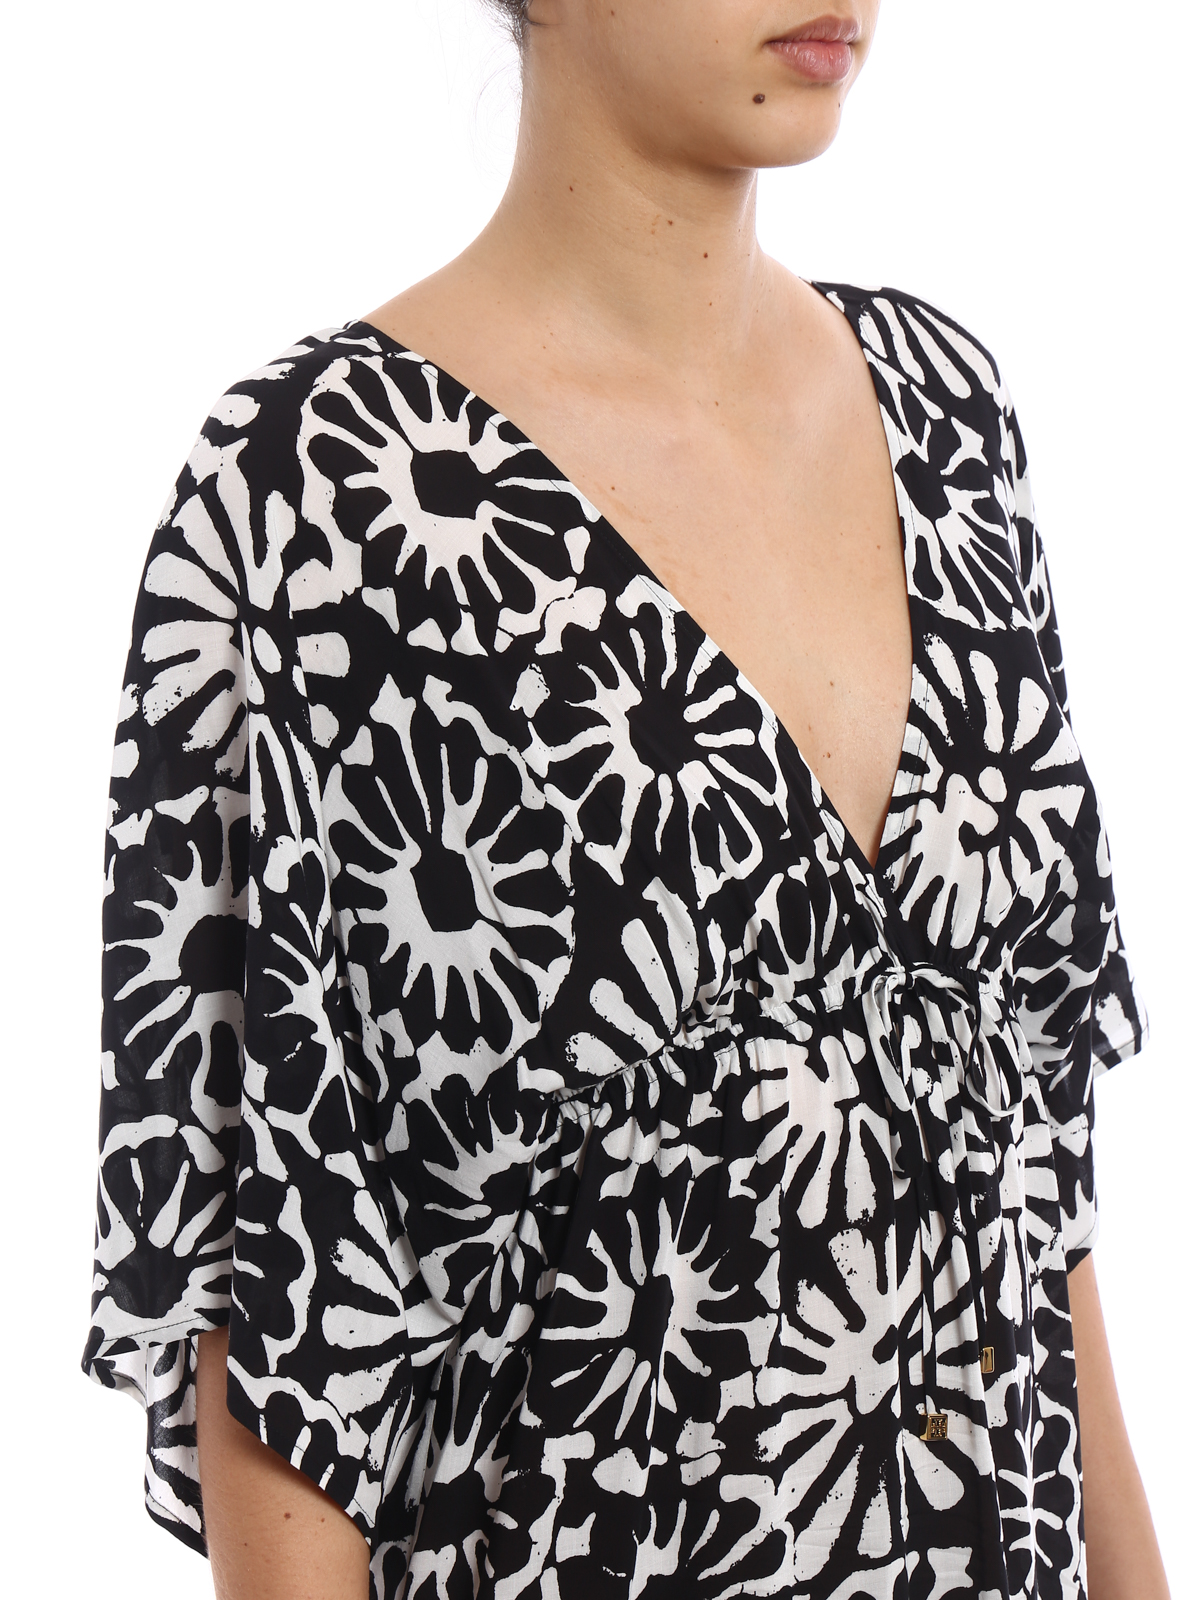 74ed14f256a89 Tory Burch - Pomelo Floral beach dress - cover-ups - 45837008 ...